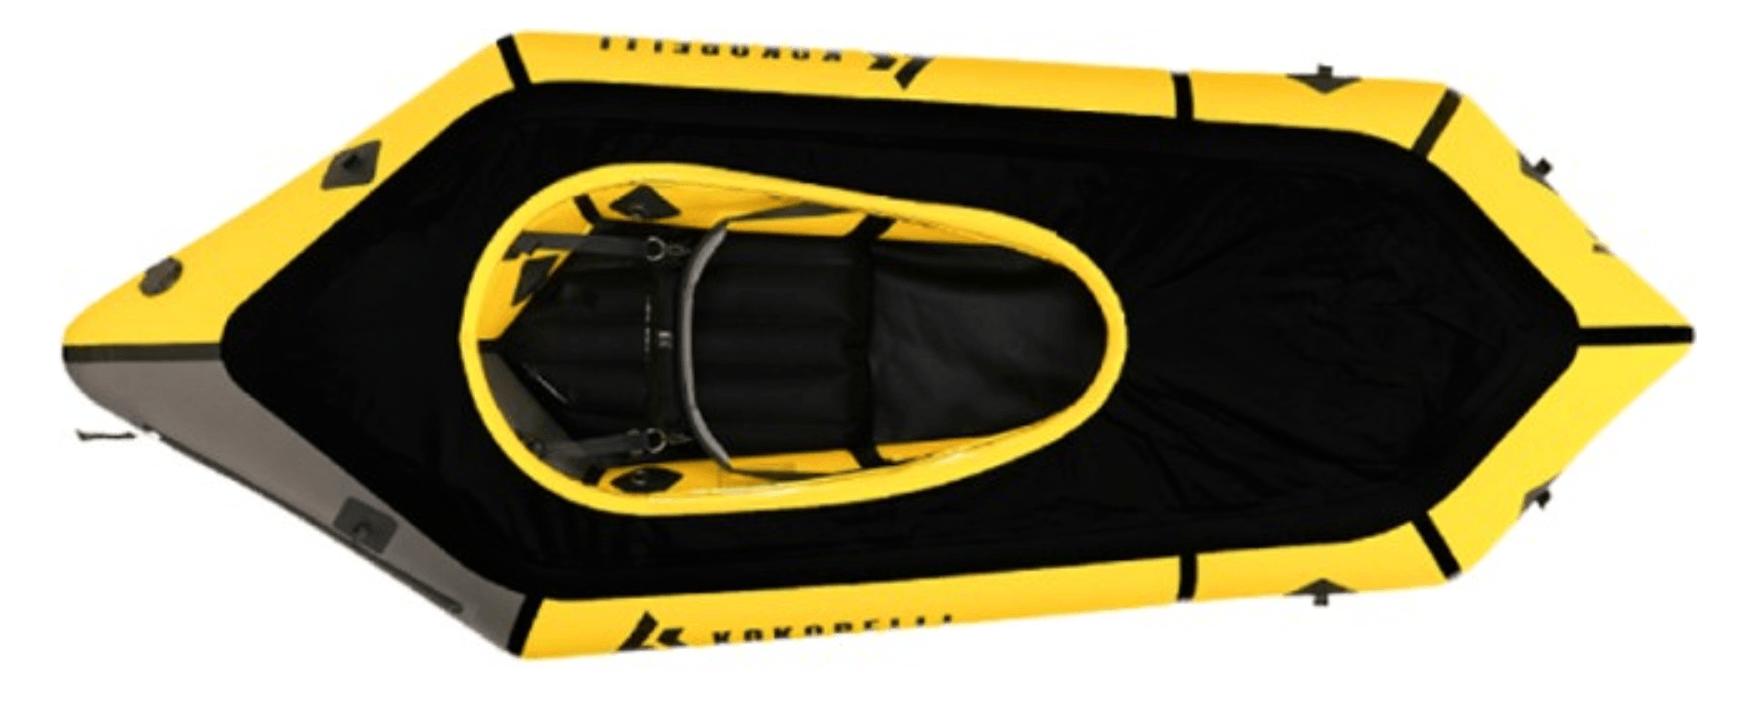 best travel kayaks